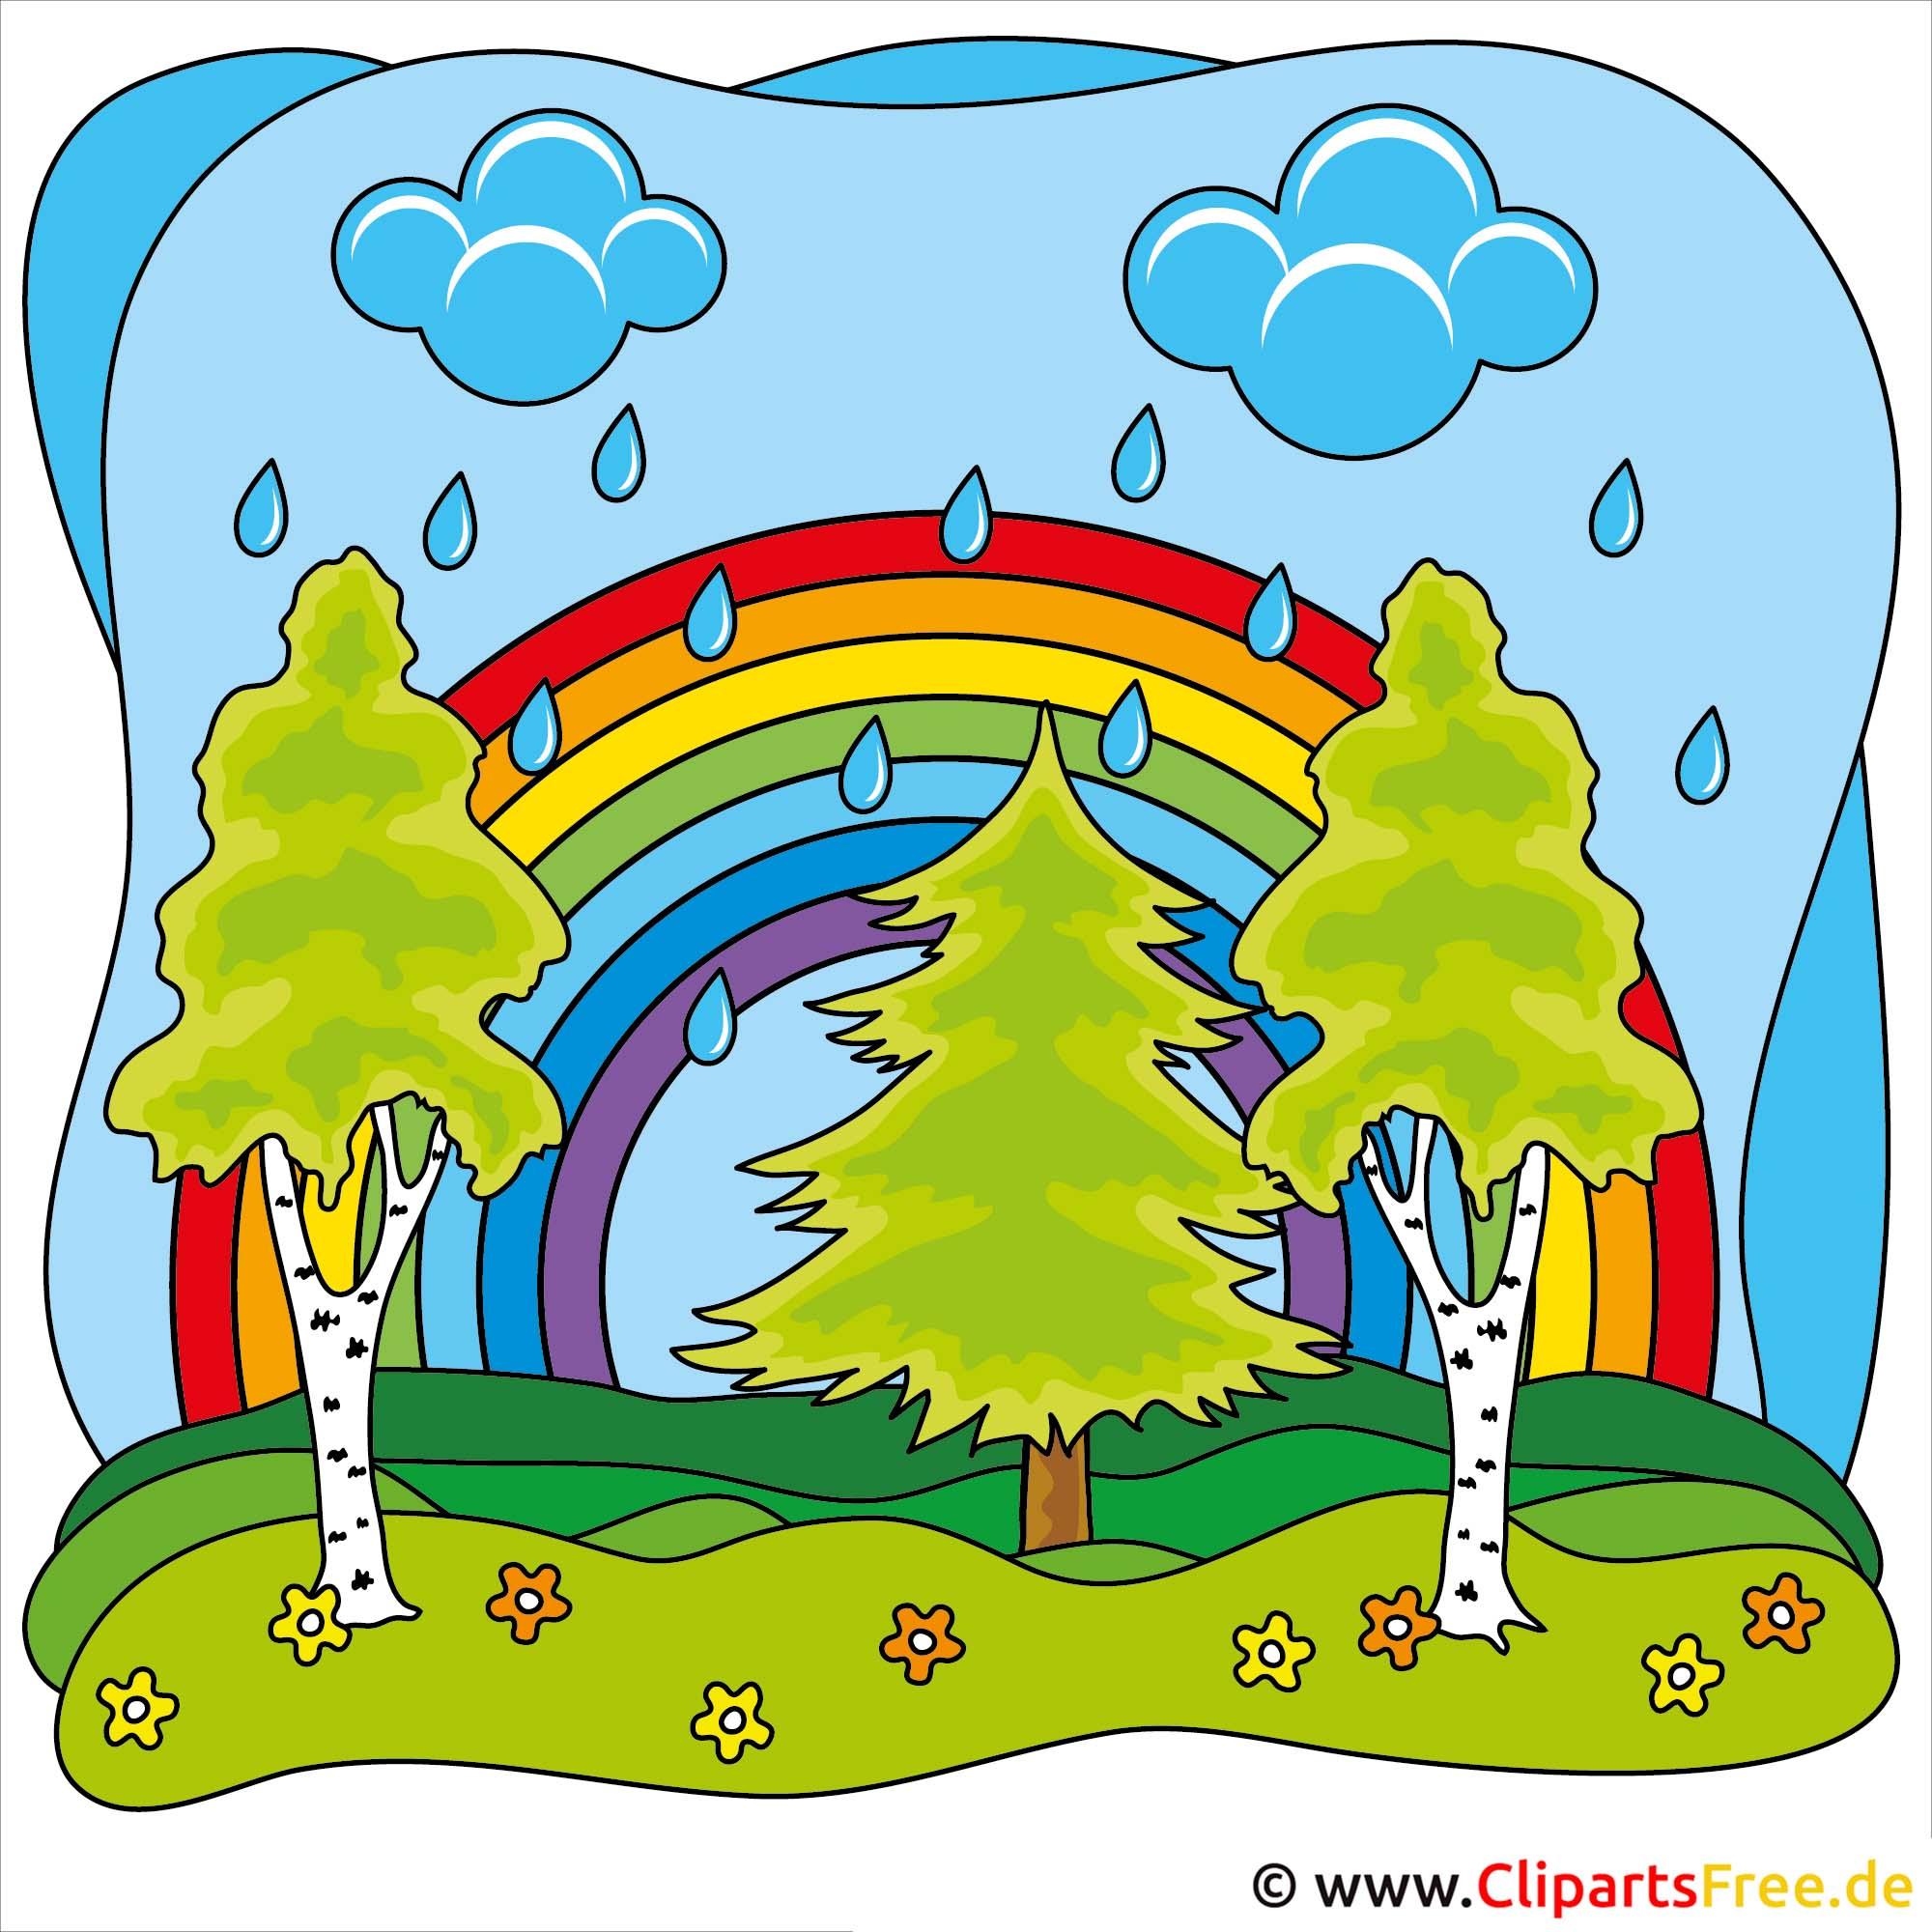 Free Fingernail Art Cliparts Download Free Clip Art Free: Sommer Clip Art Free Download